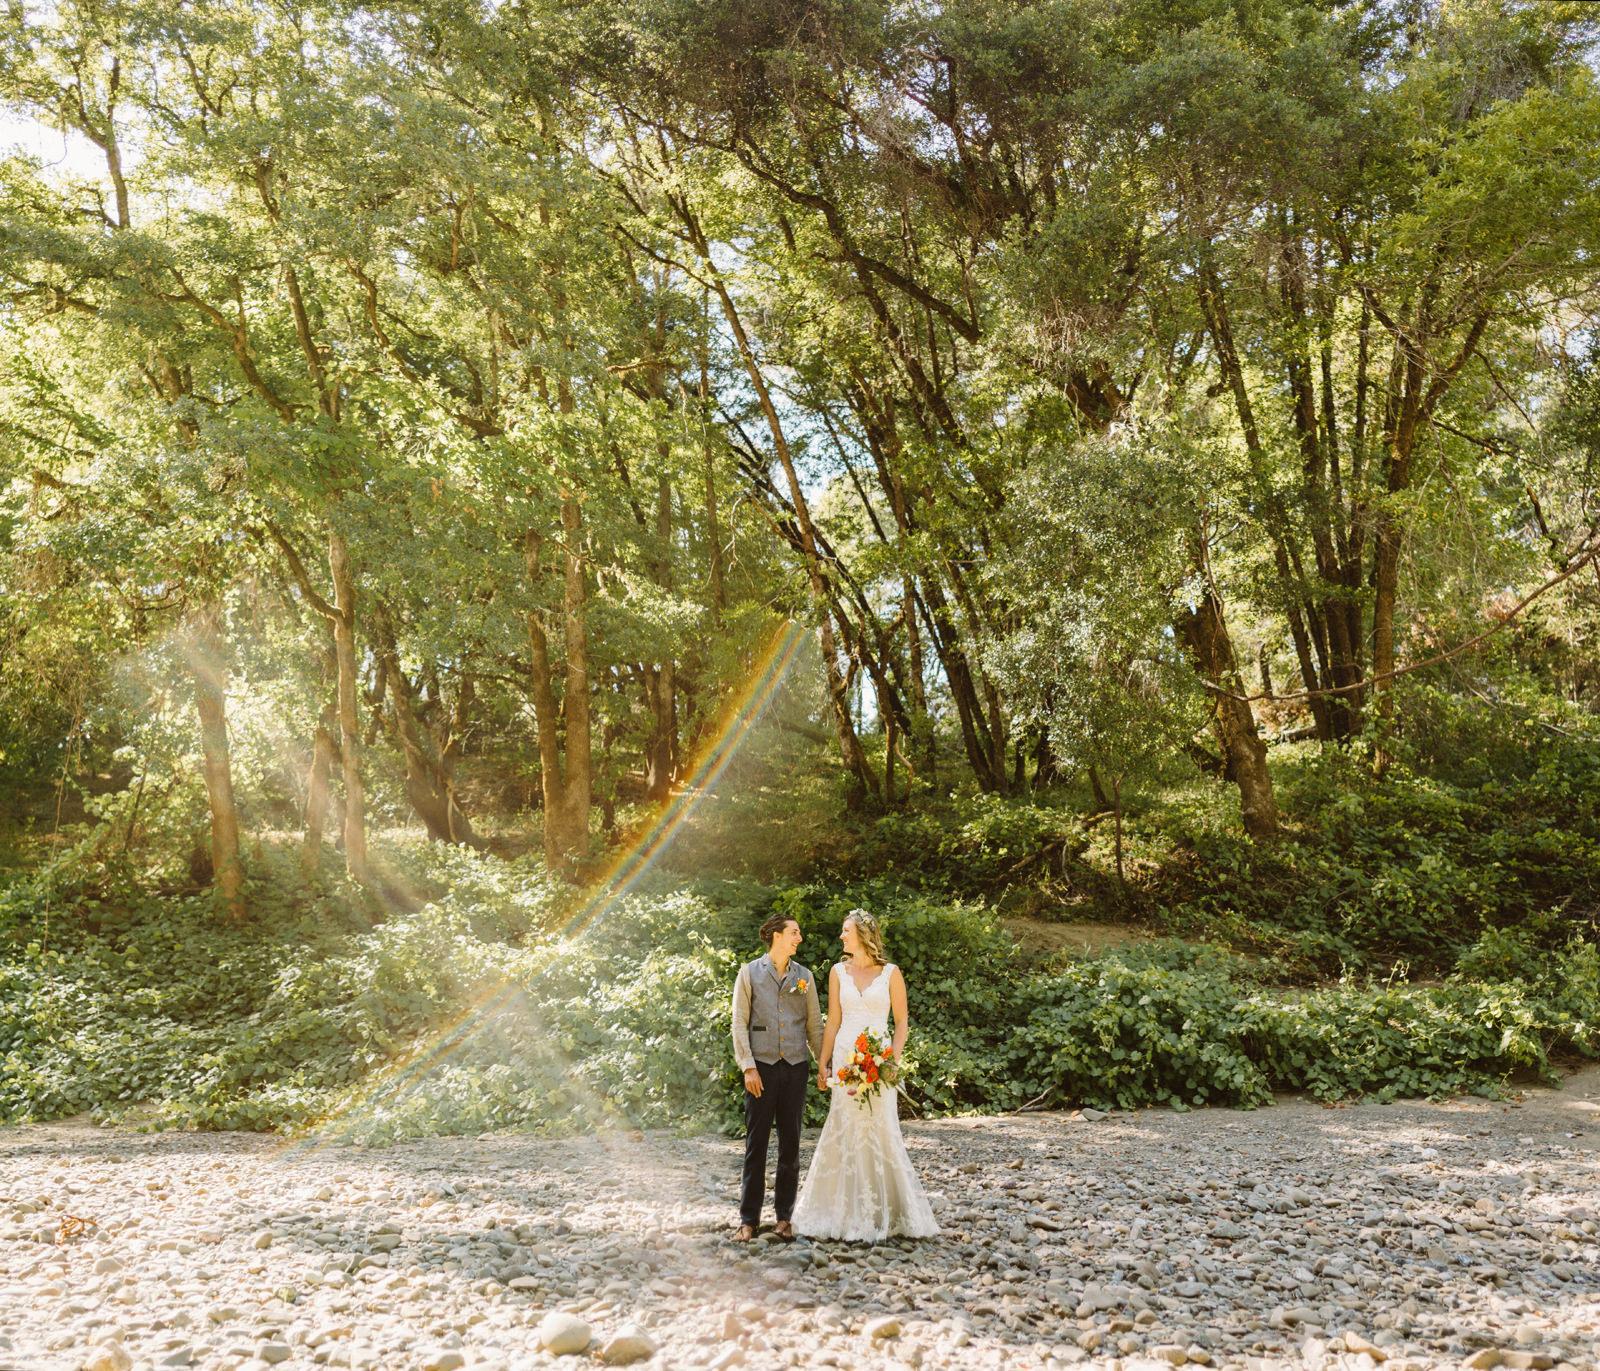 rivers-bend-retreat-wedding-056 RIVER'S BEND RETREAT WEDDING